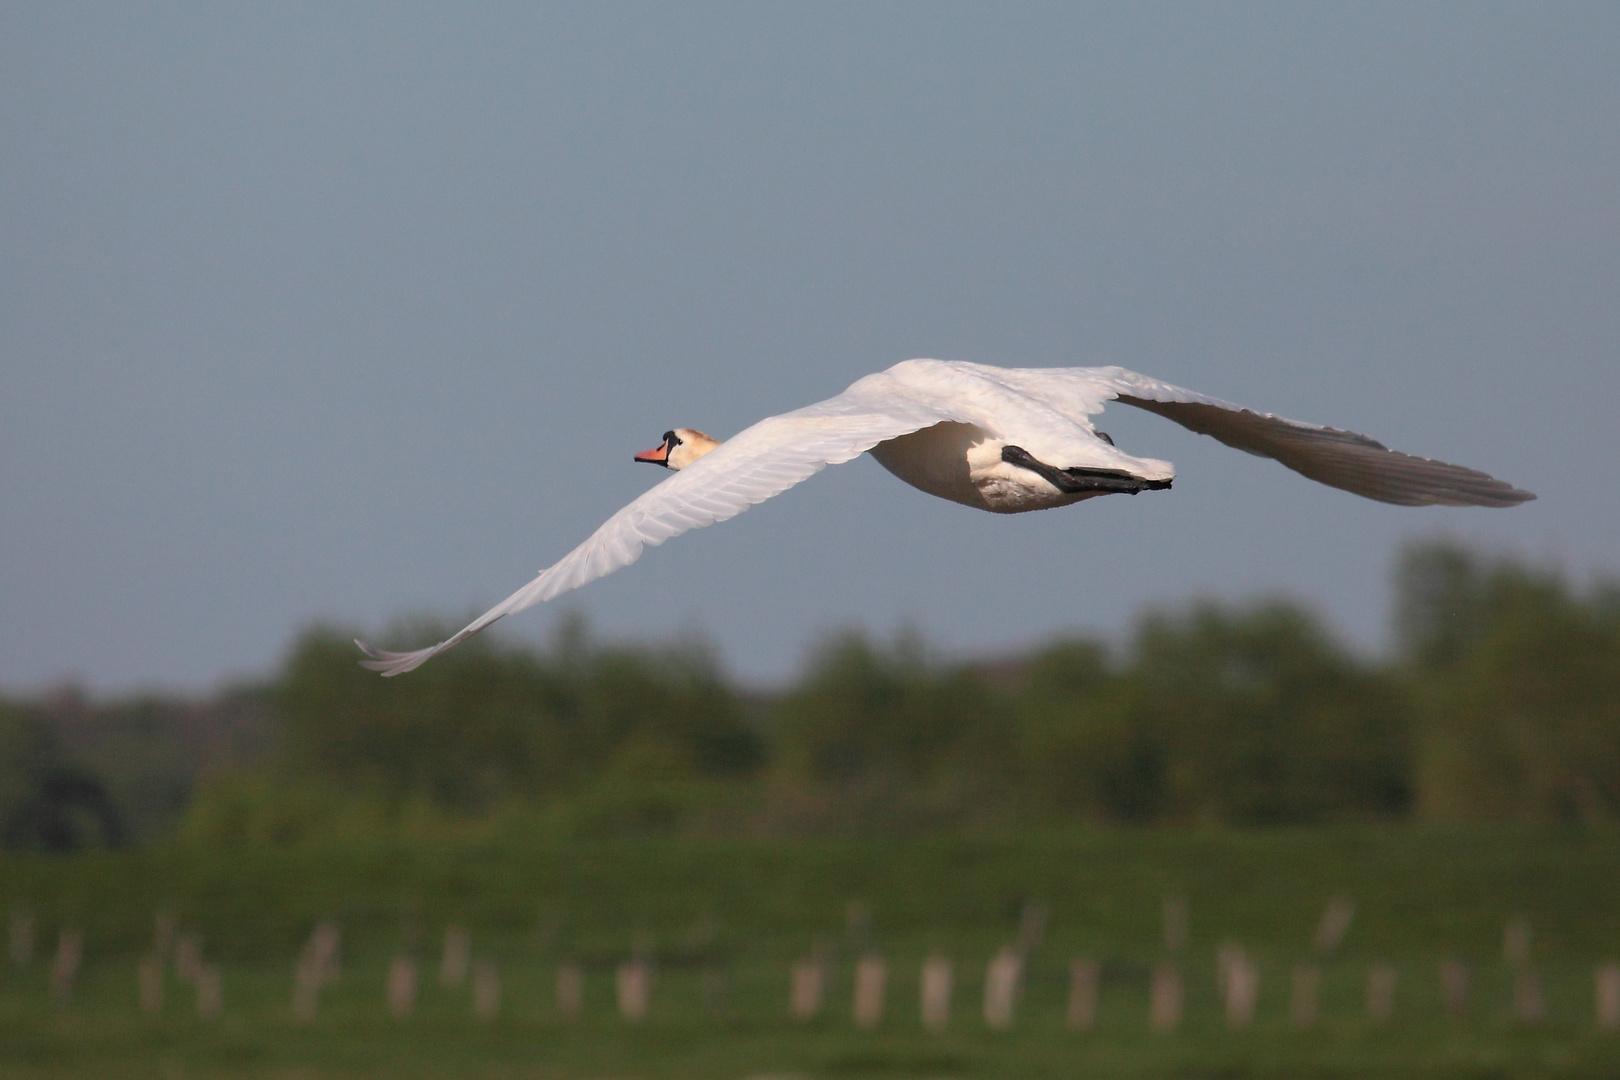 Eleganter Flieger #2